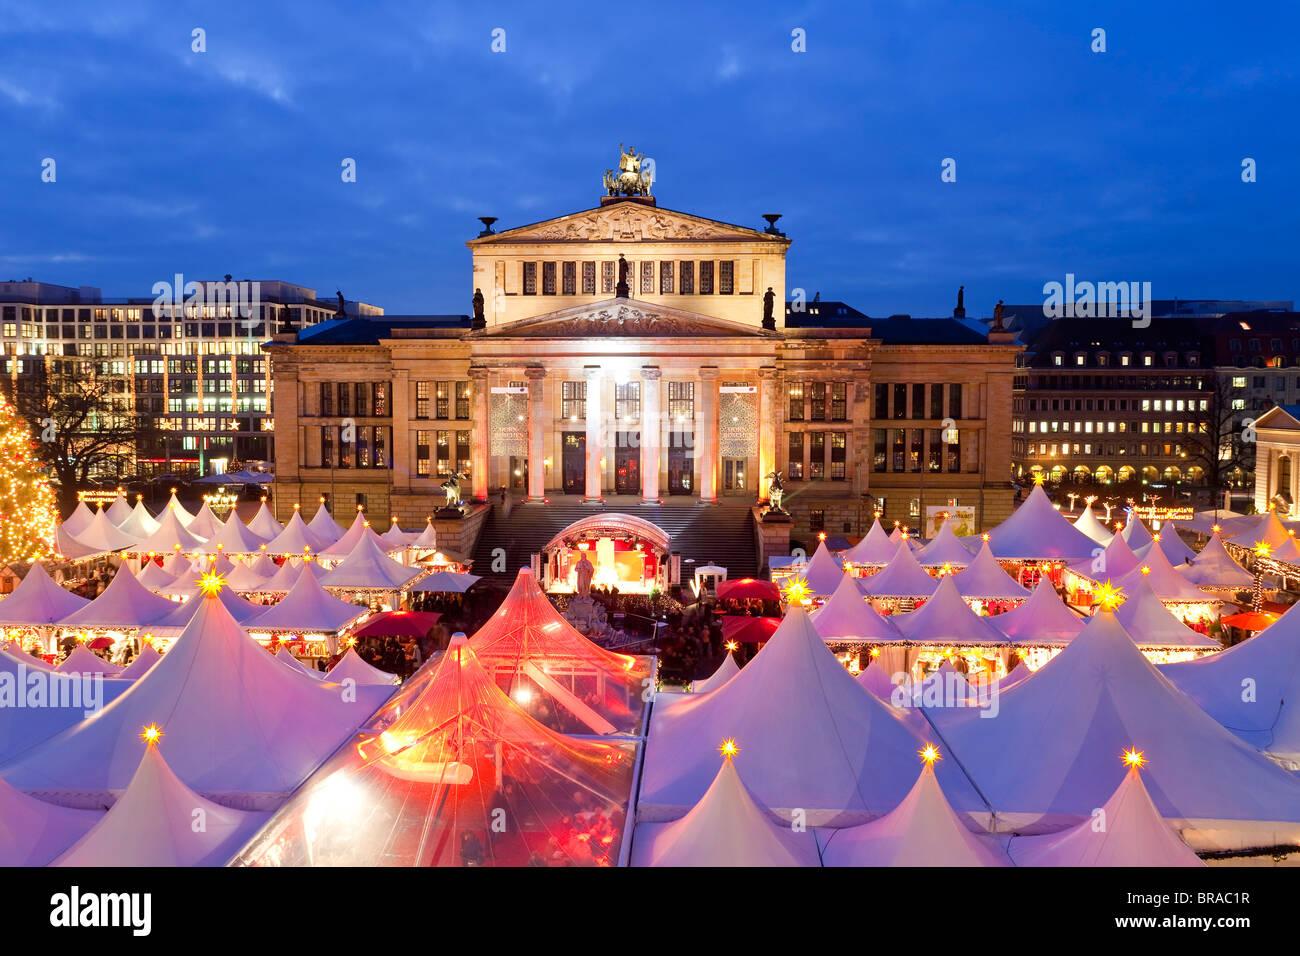 Tradicional Mercado de Navidad en Gendarmenmarkt, iluminada al anochecer, Berlín, Alemania, Europa Imagen De Stock